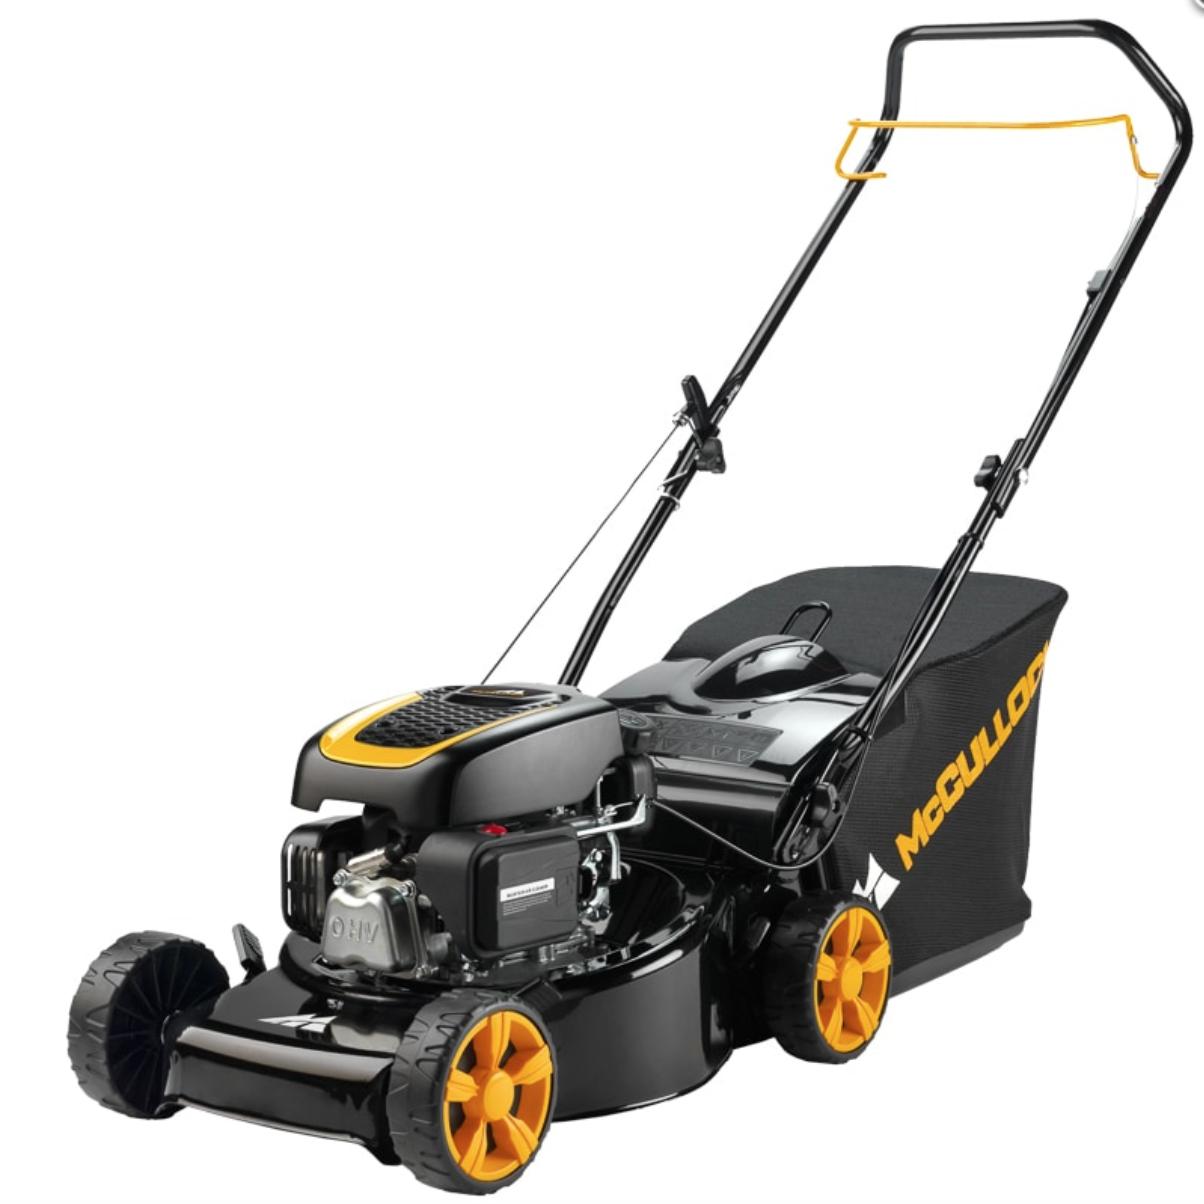 McCulloch petrol lawnmower £79 instore @ B&M Oldham